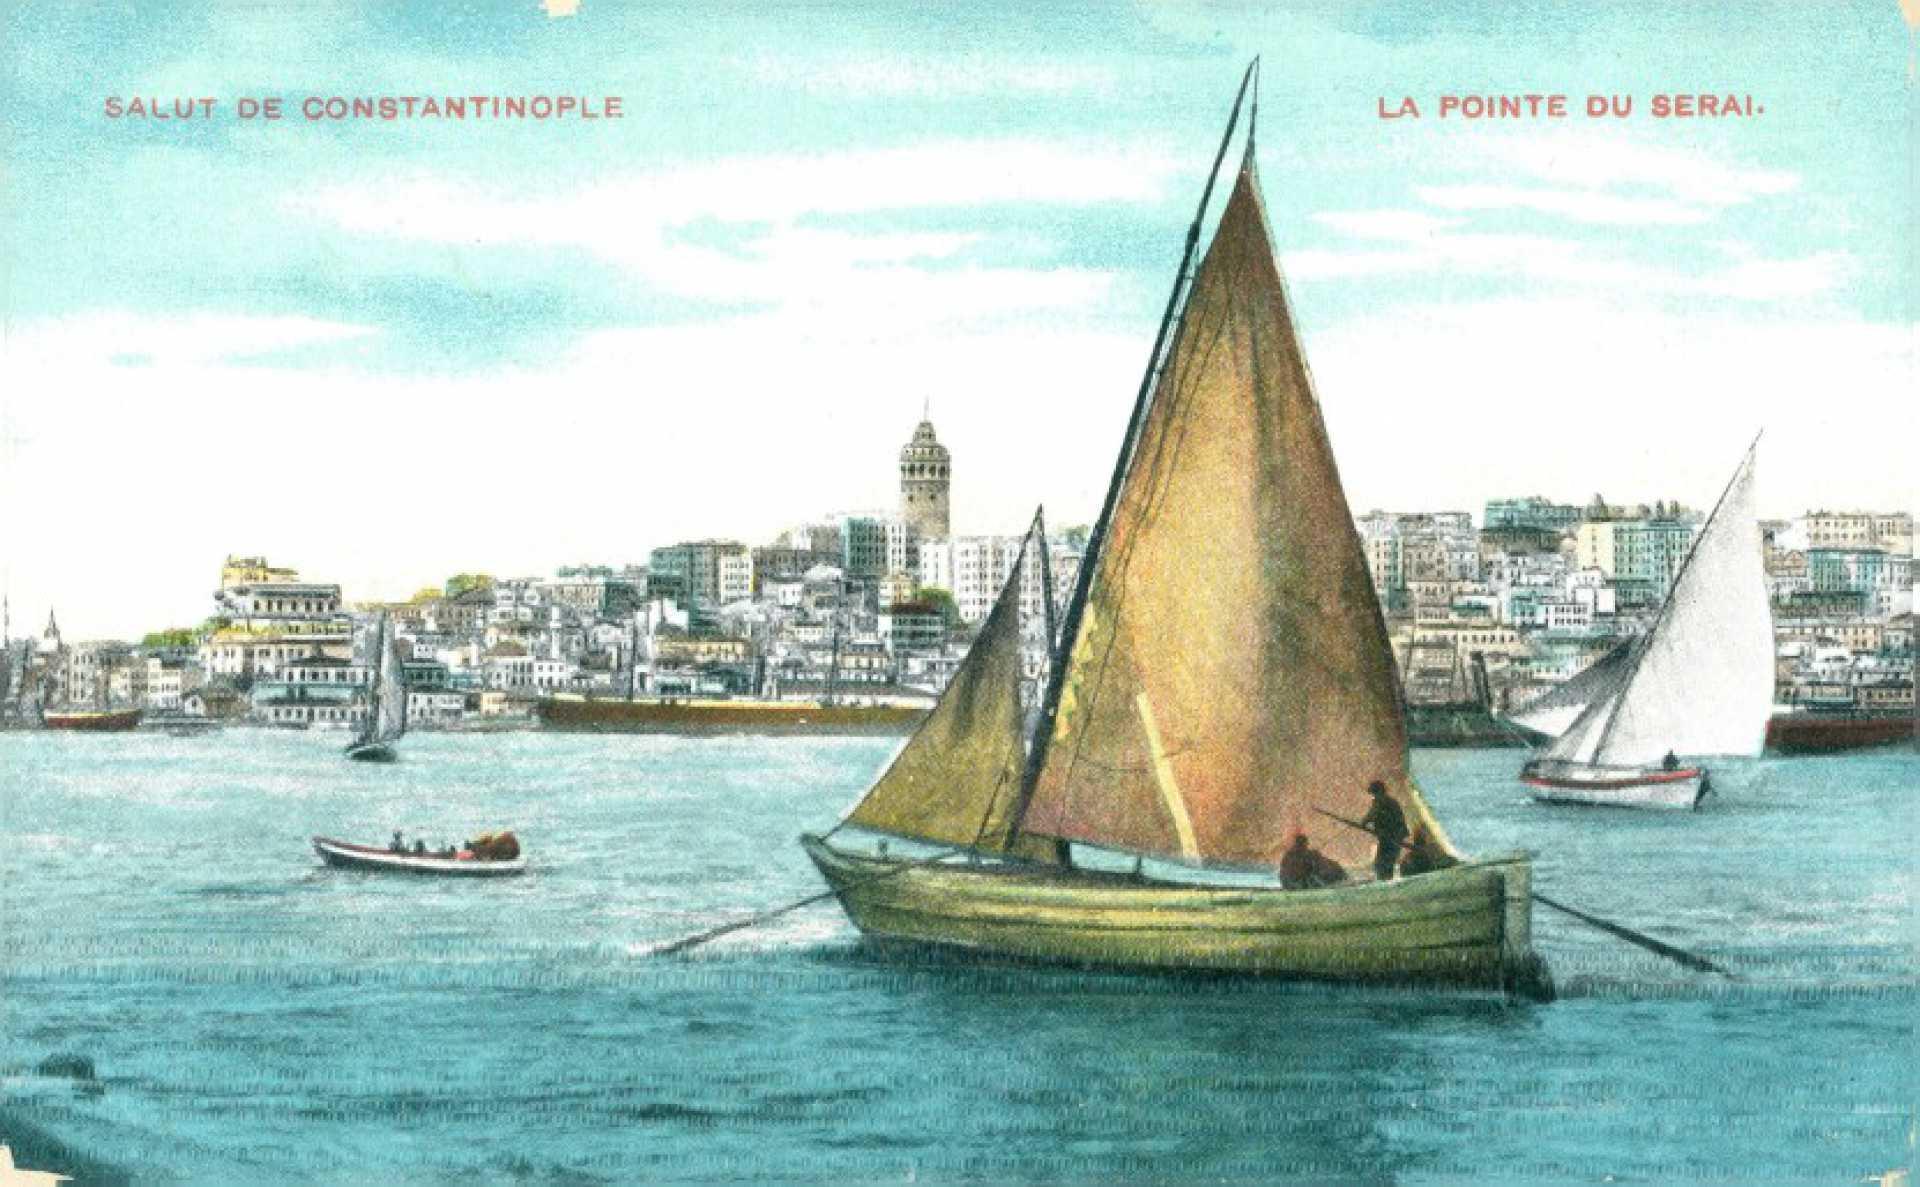 Salut de Constantinople. Le Pointe du Serai